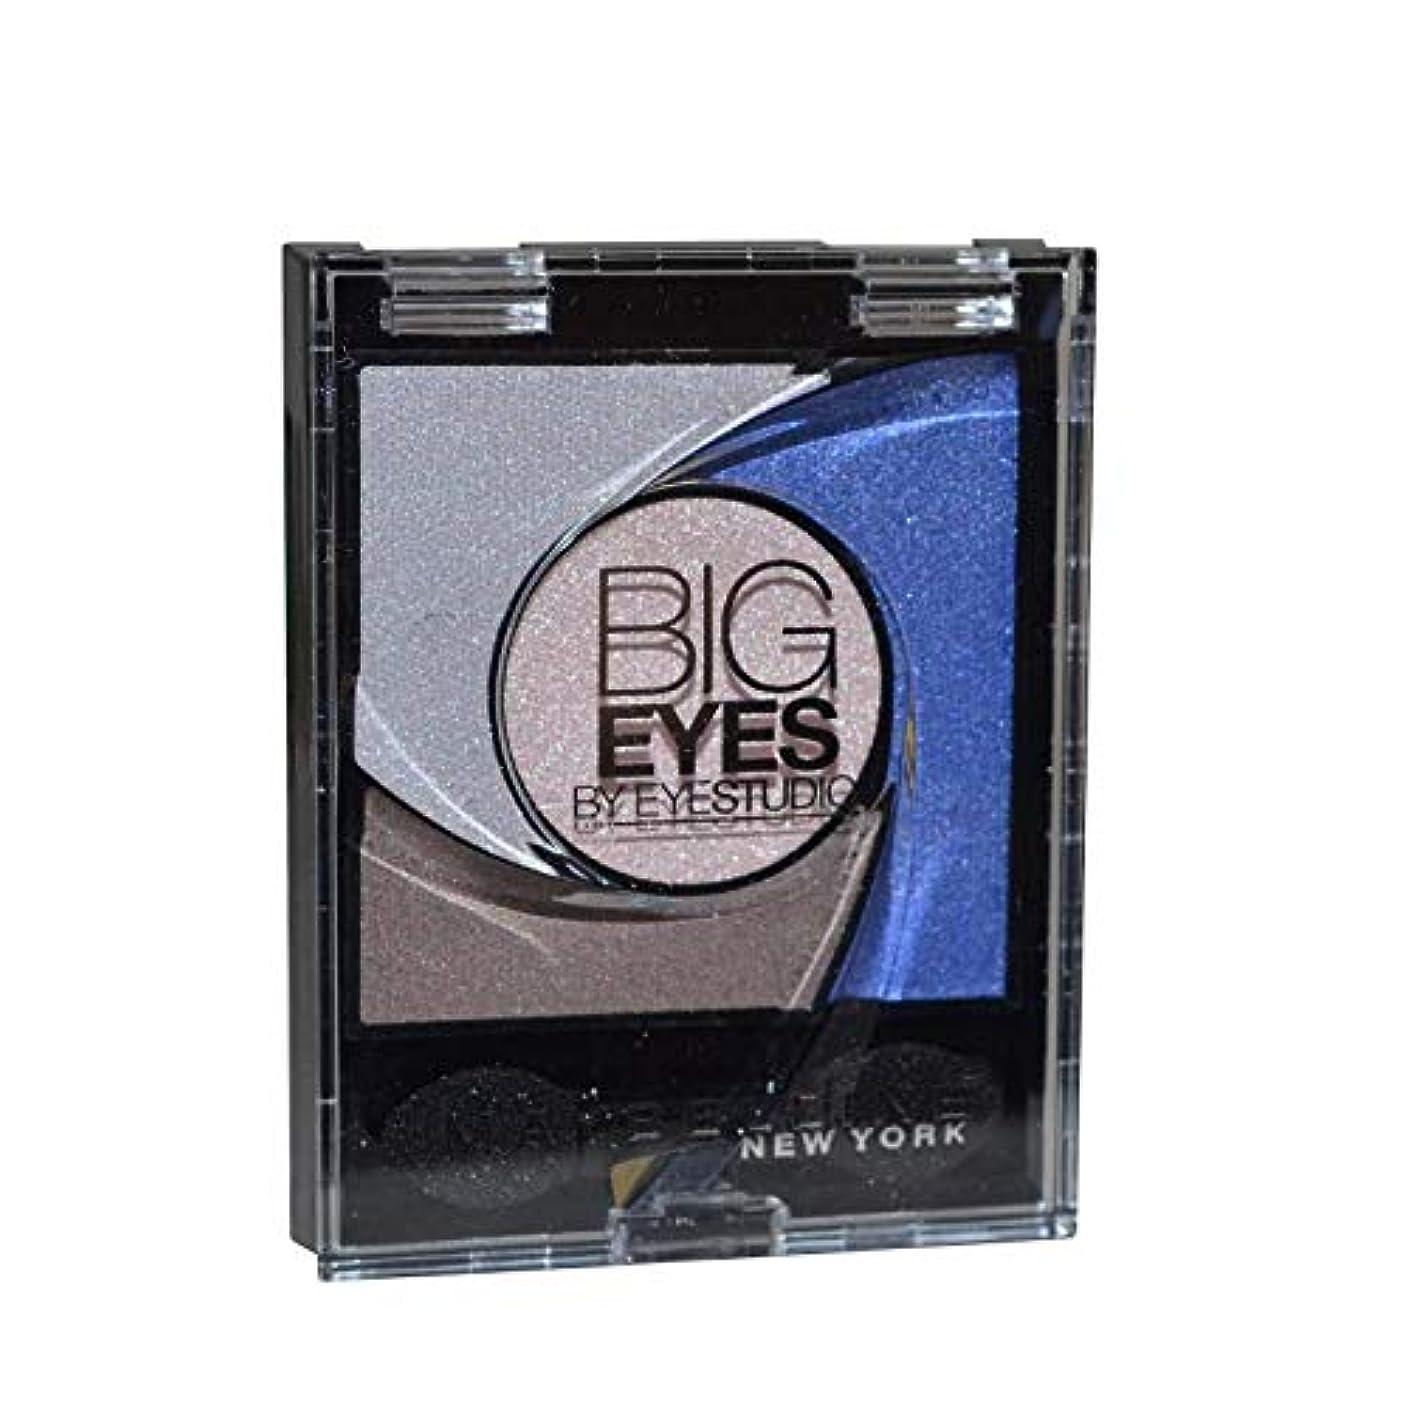 頬共産主義面倒Maybelline New York Lidschatten Eyestudio Big Eyes Palette Blue 04 / Eyeshadow Set in Blau-Tönen mit Wet-Technologie...